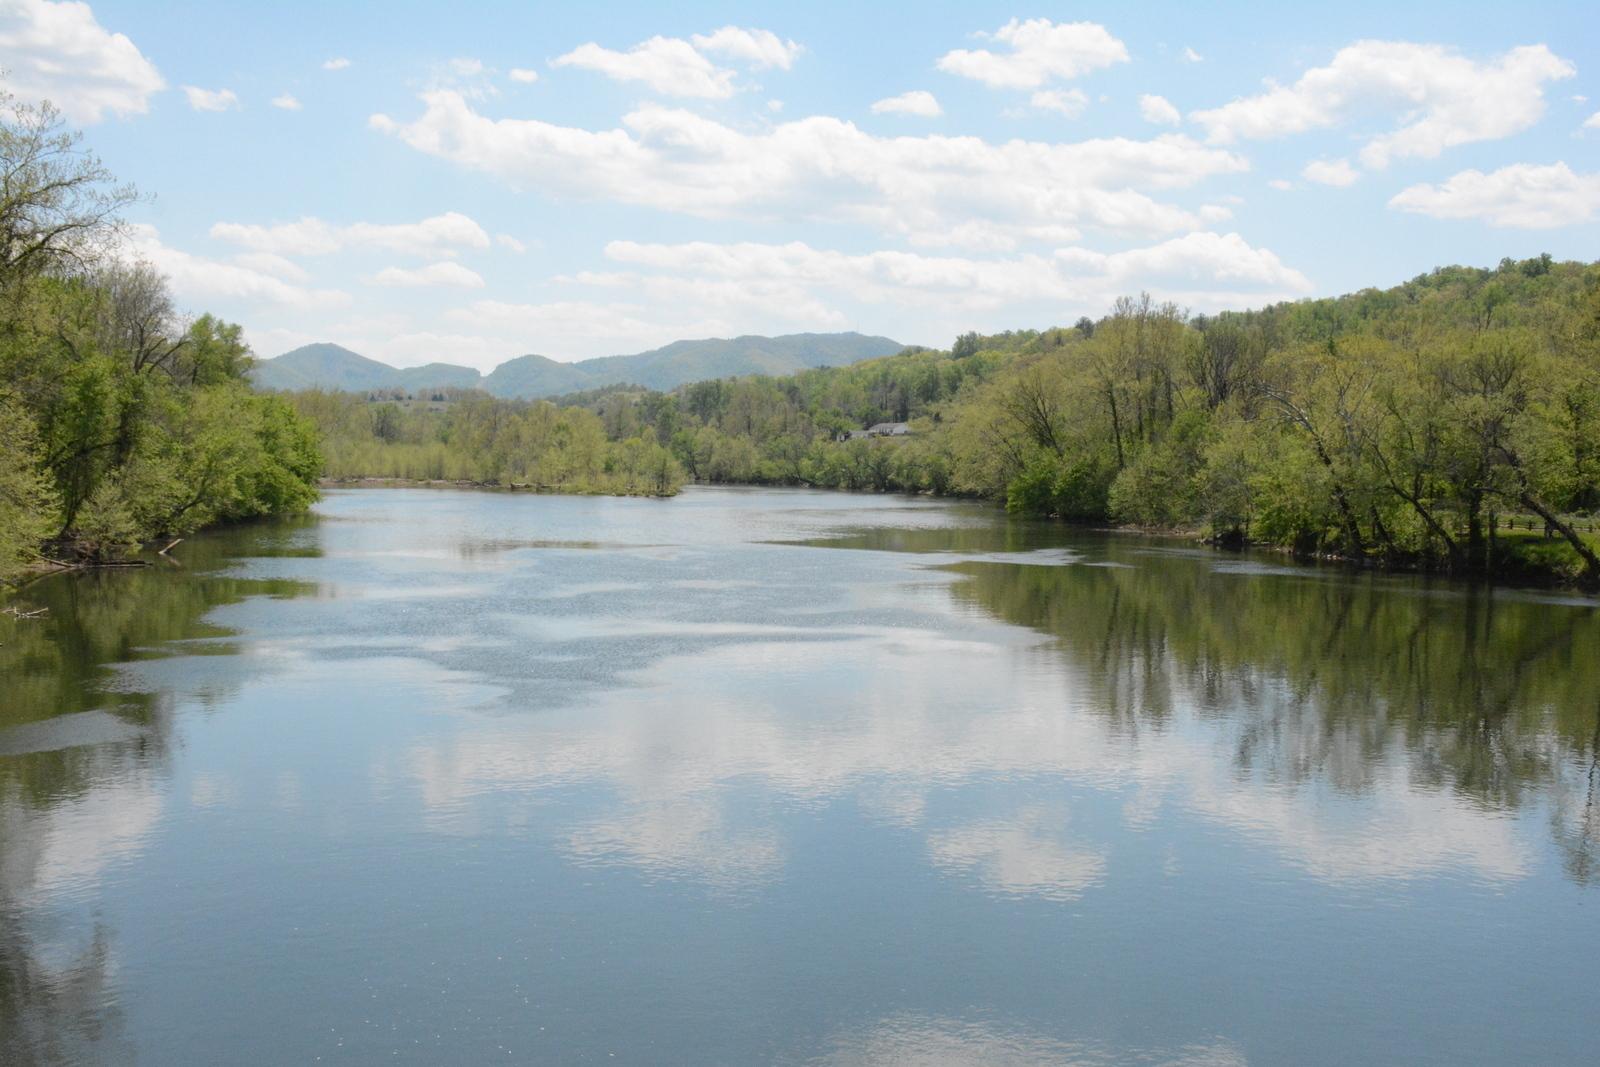 James River Visitor Center - Blue Ridge Parkway - Big Island, Virginia